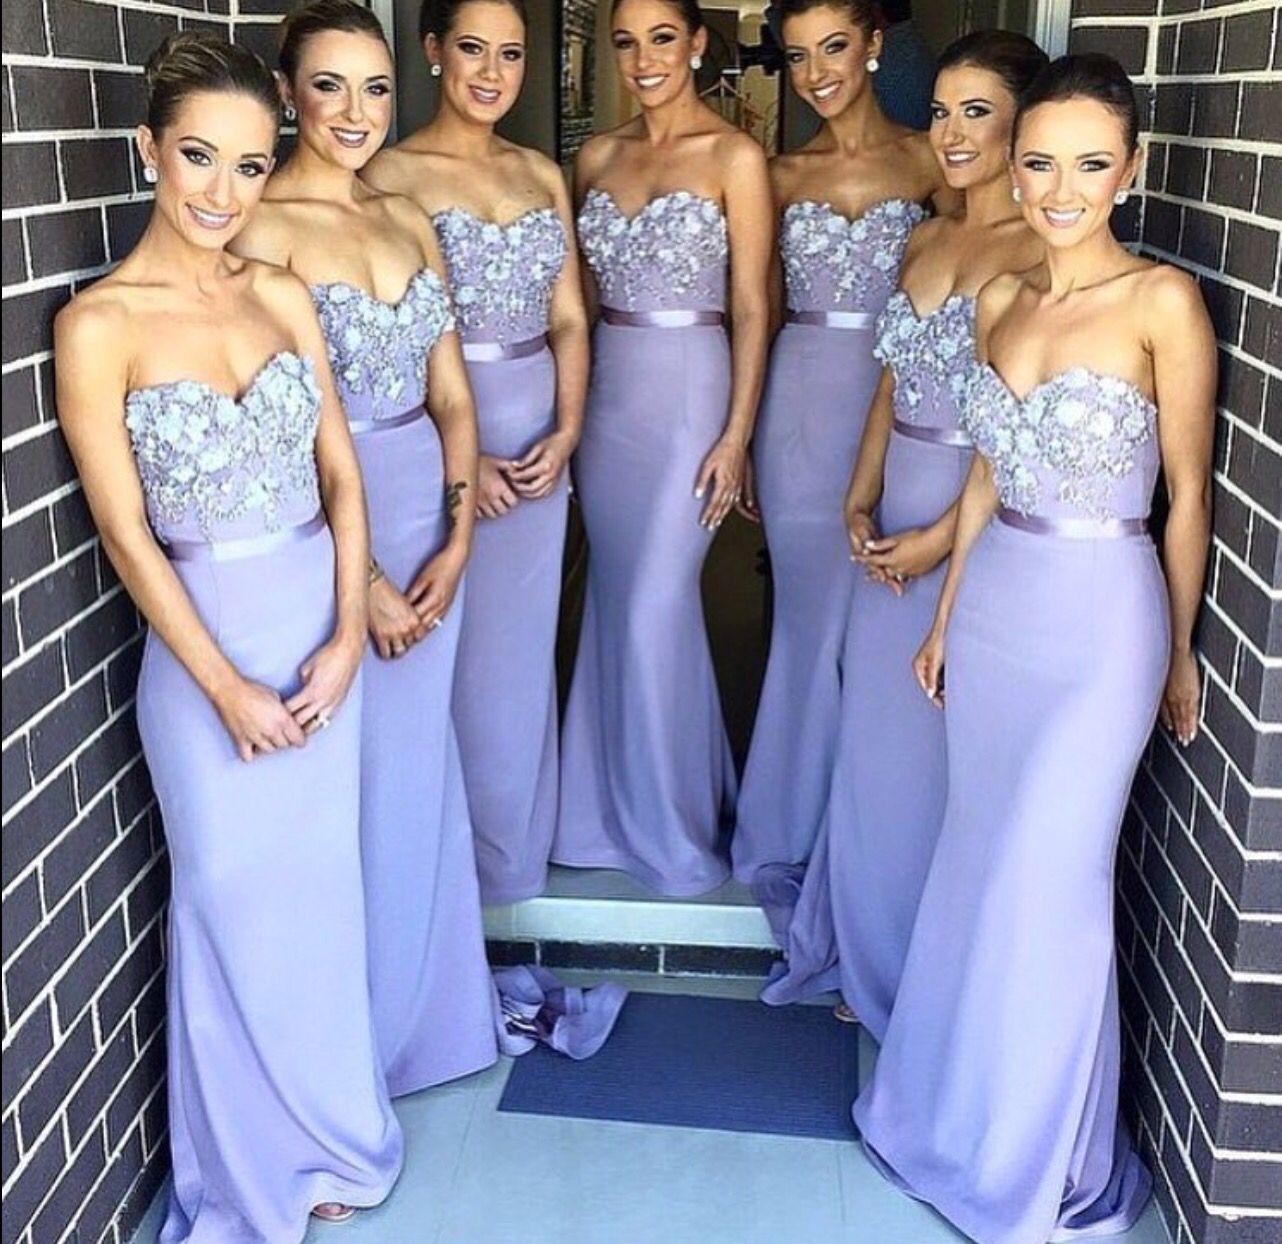 Lila Jurk Bruiloft.Lila Bruidsmeisjes Jurk Wedding Bridesmaid Dresses Lilac